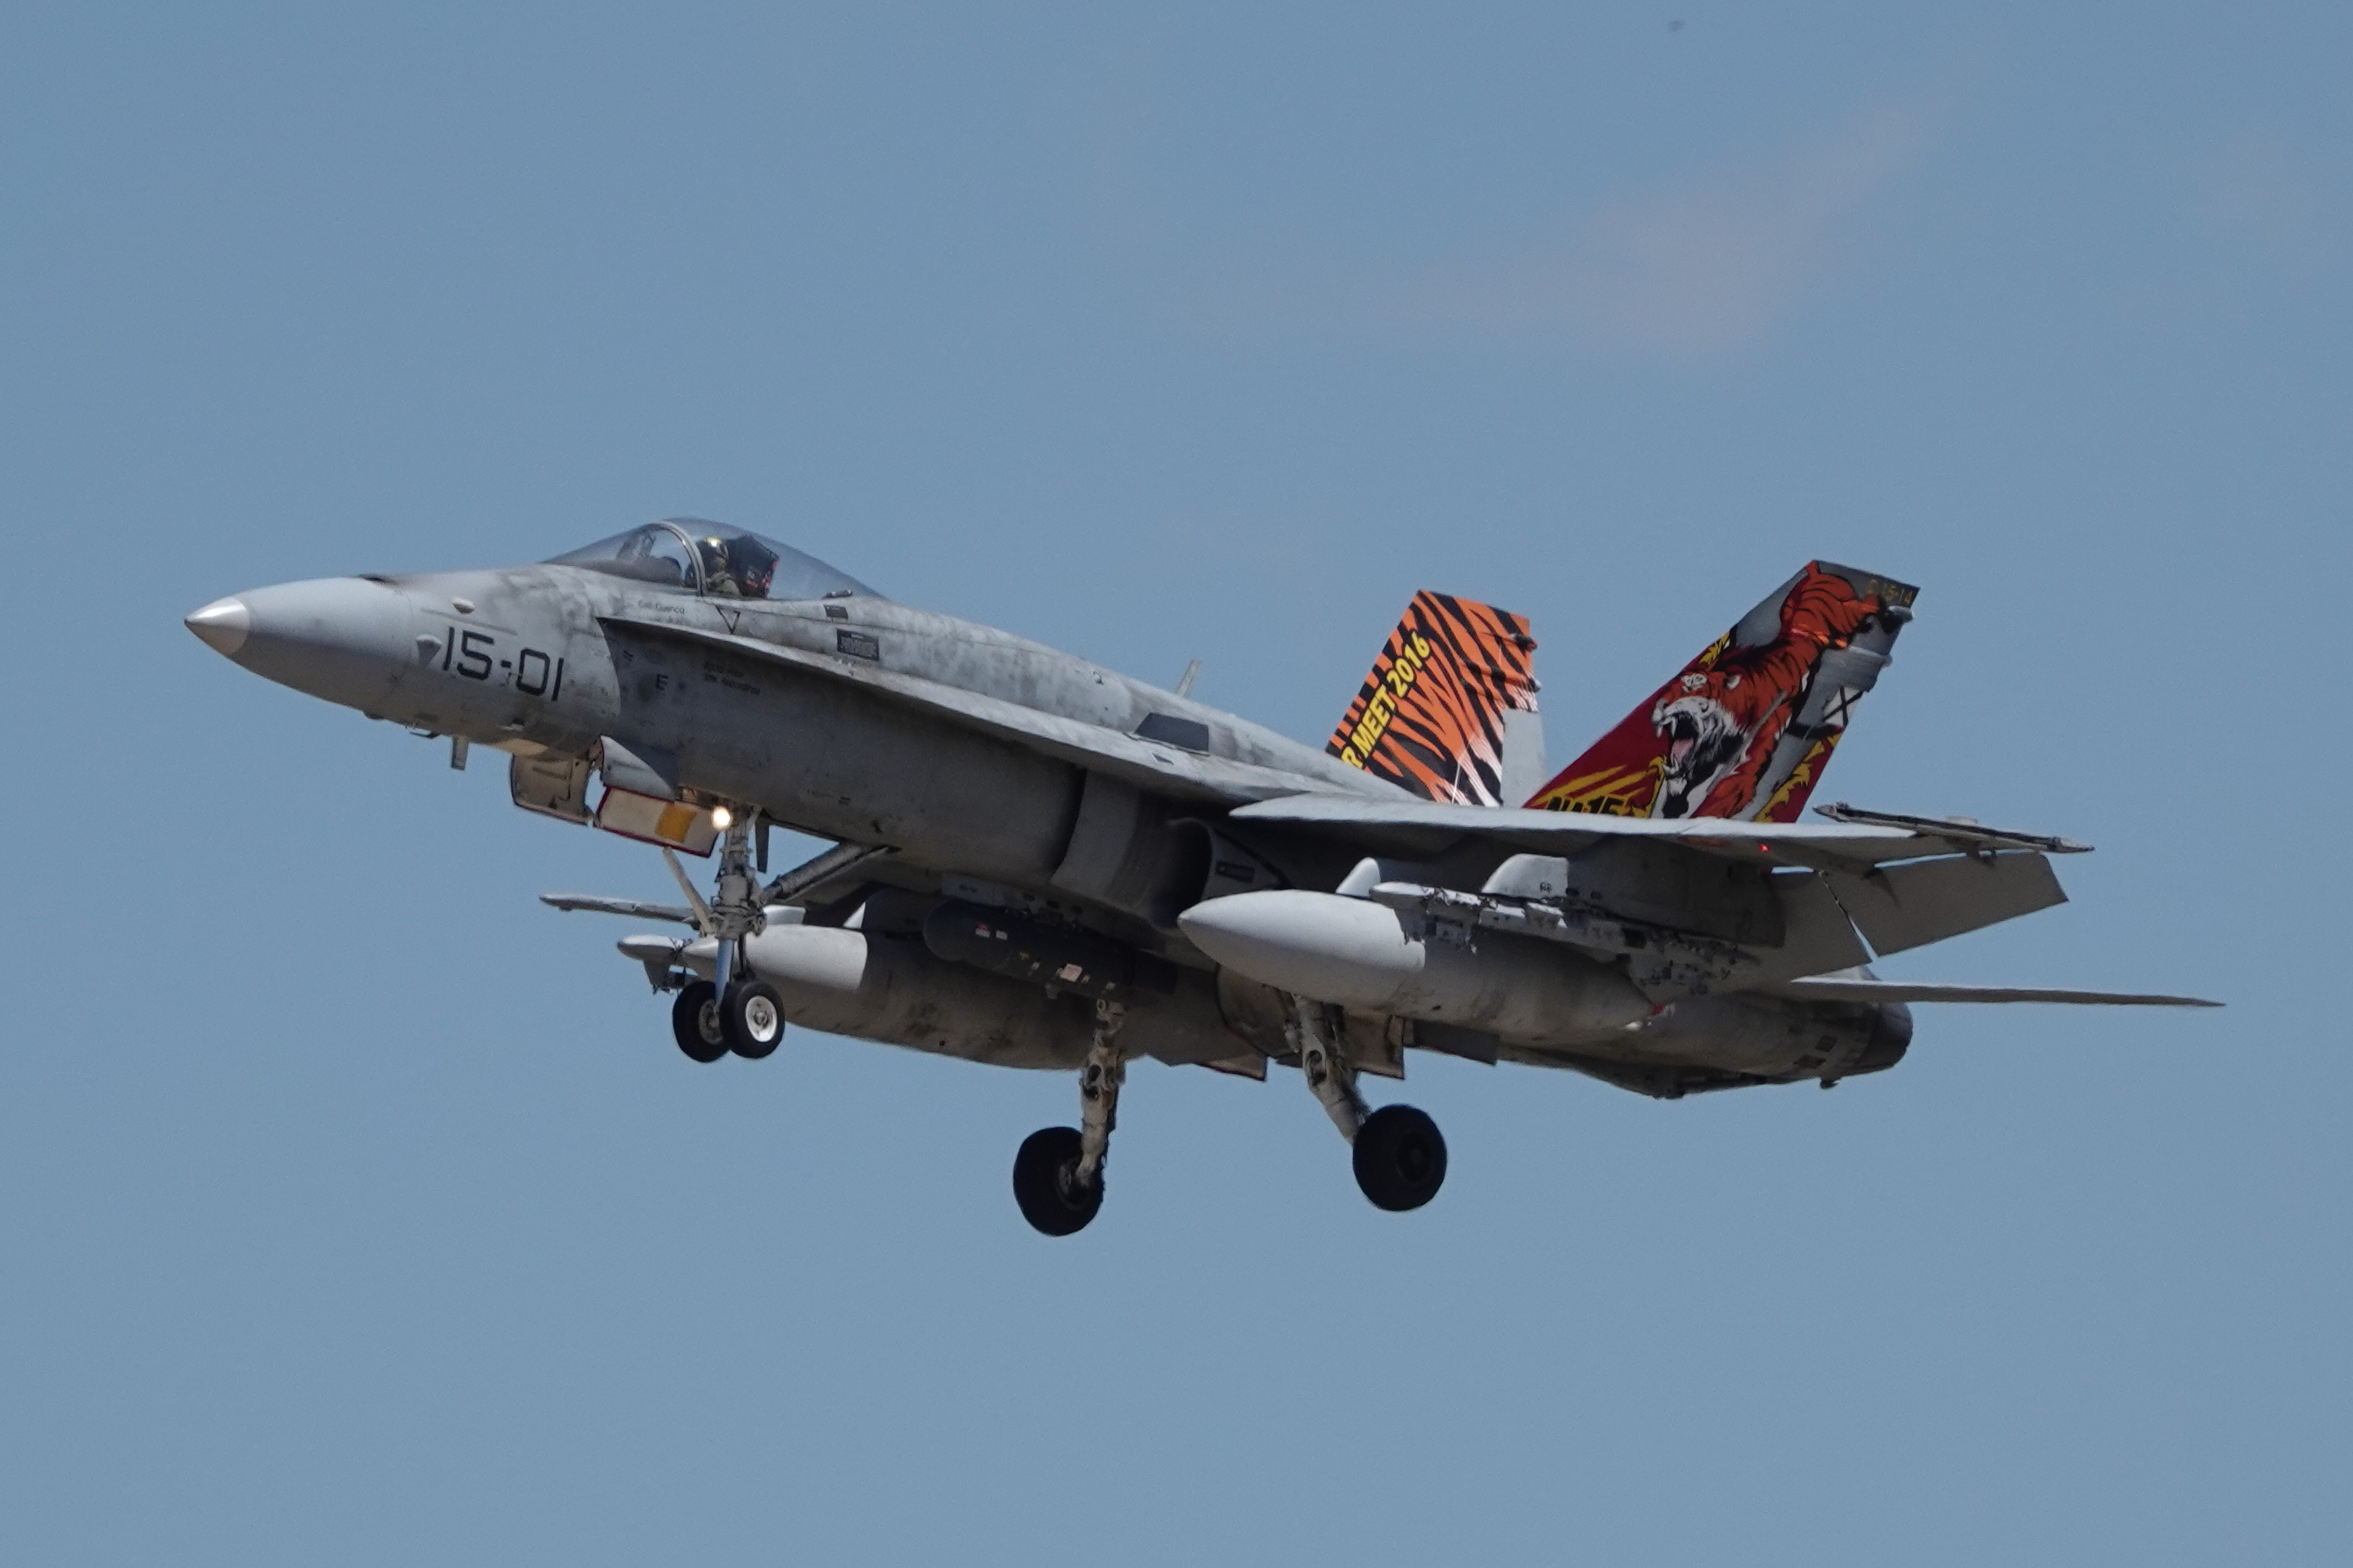 F-18 15-01